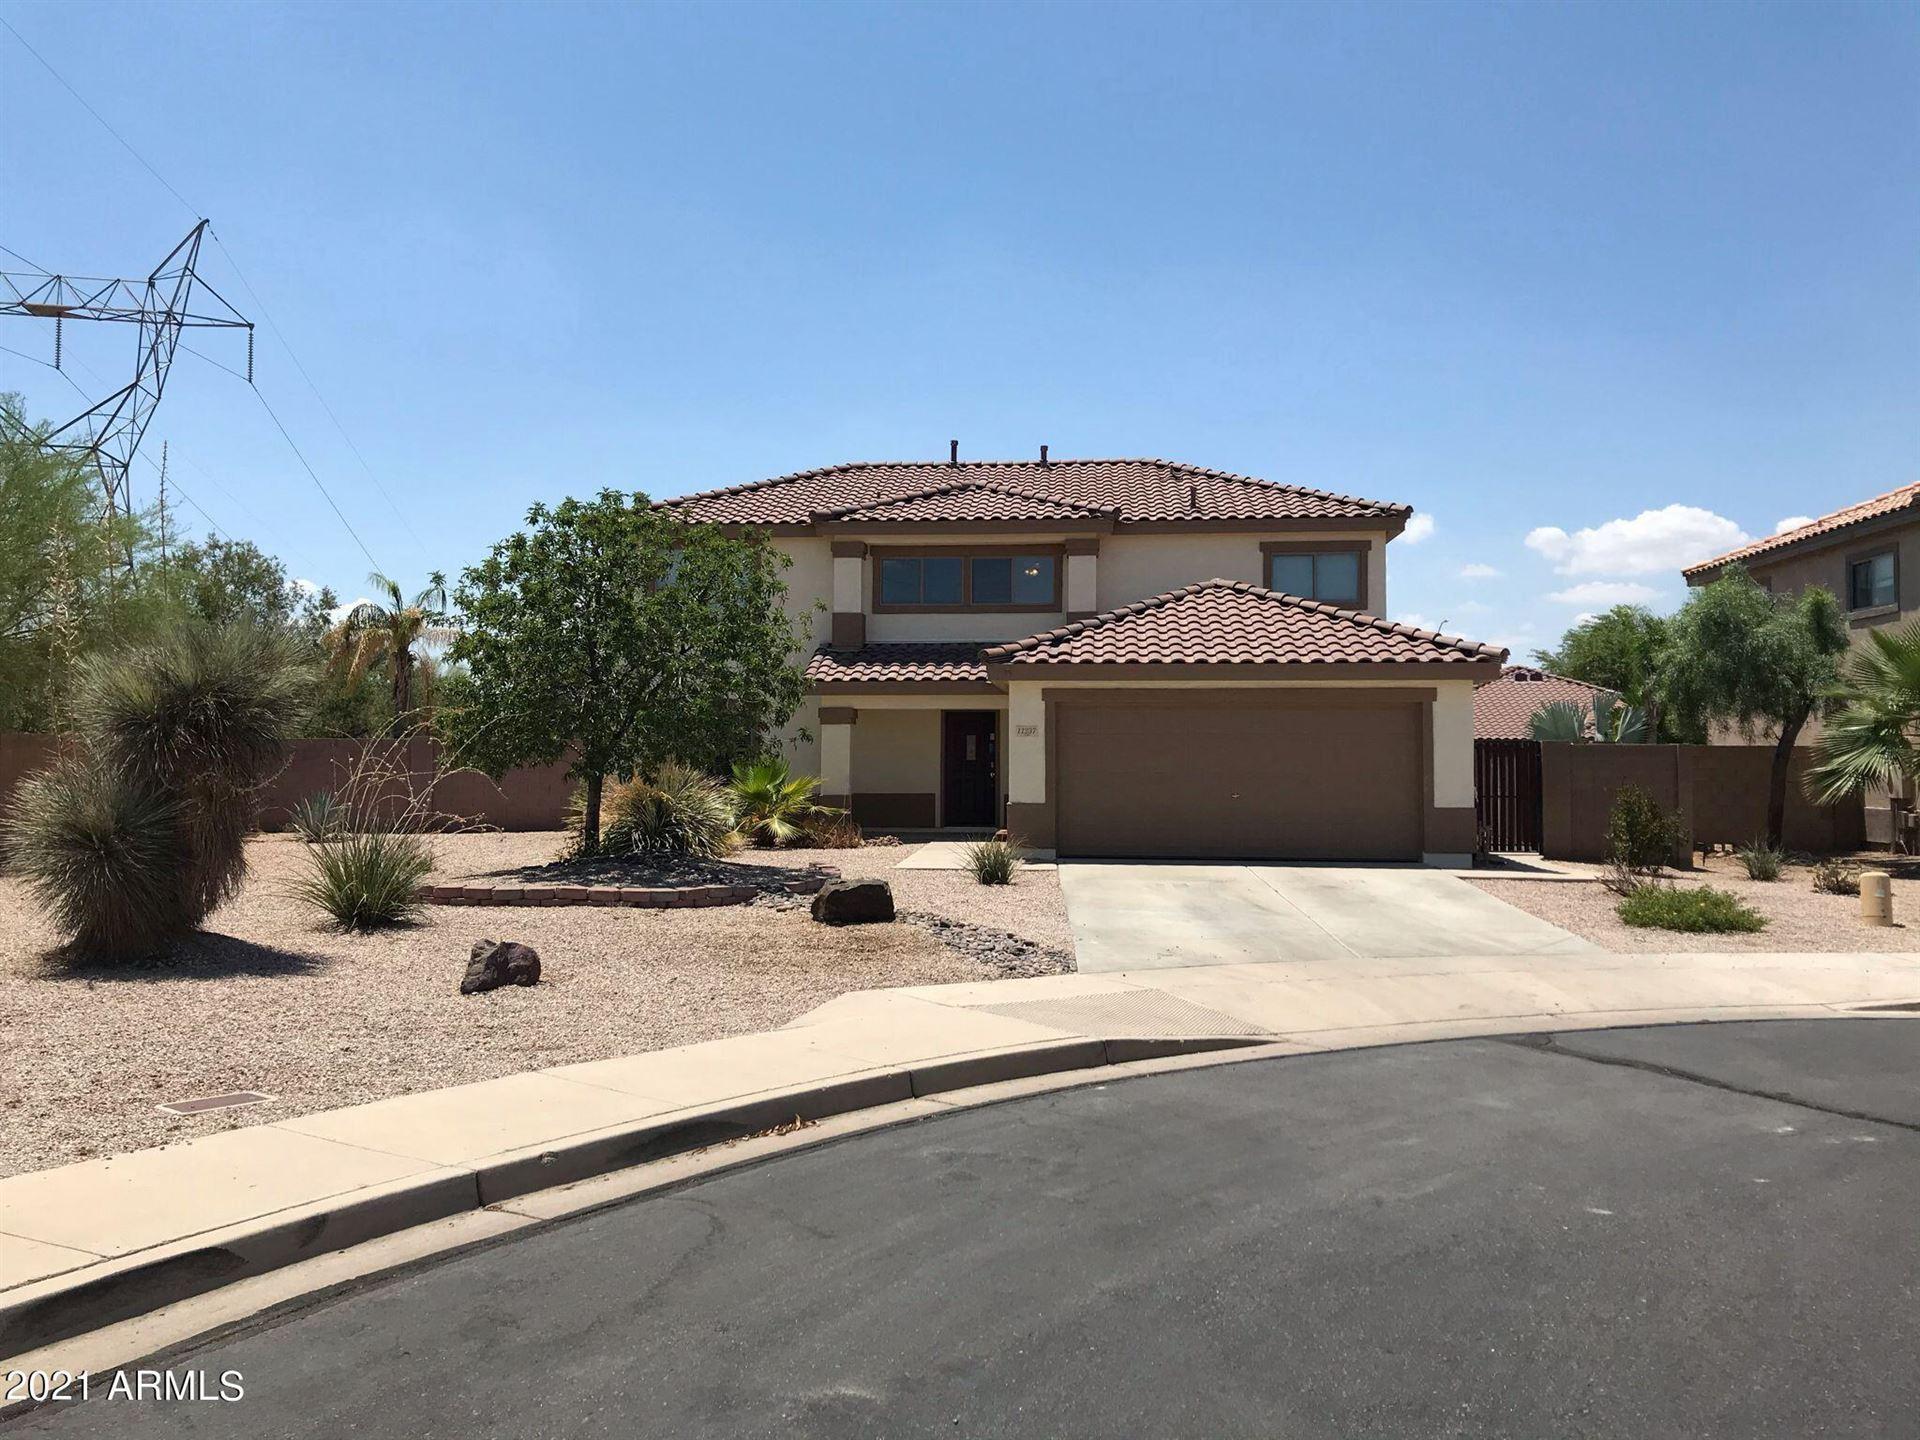 11237 E RAMBLEWOOD Circle, Mesa, AZ 85212 - MLS#: 6257089